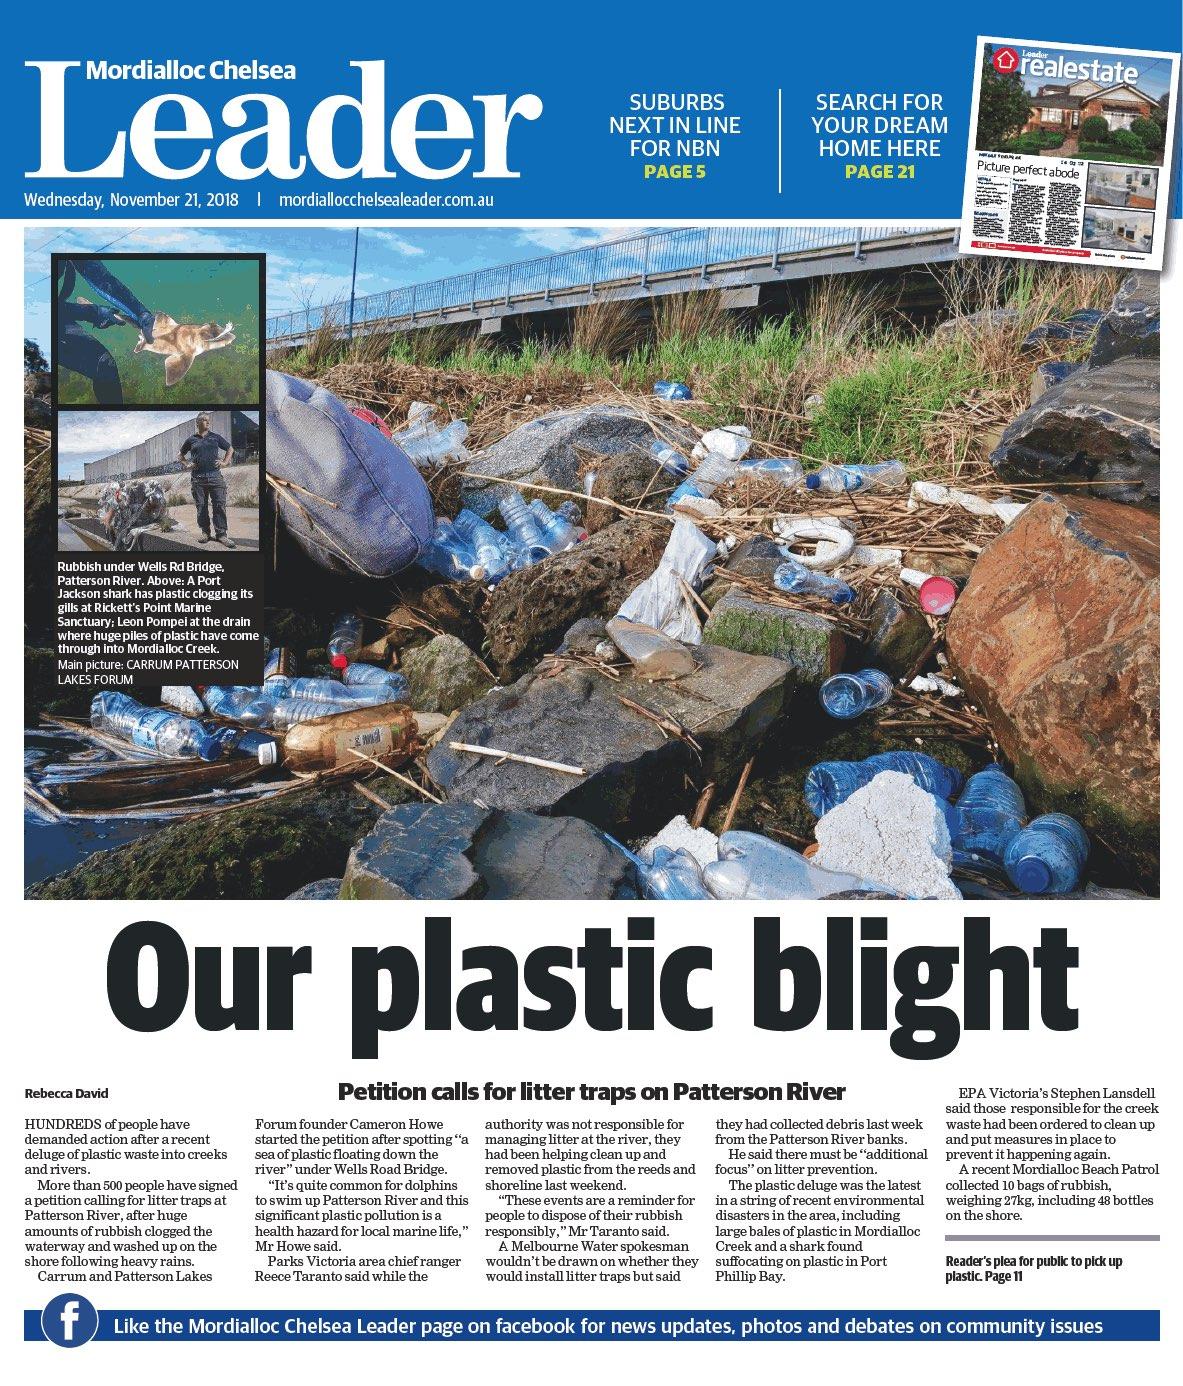 pattterson river litter traps rubbish mordialloc chelsea leader cameron howe